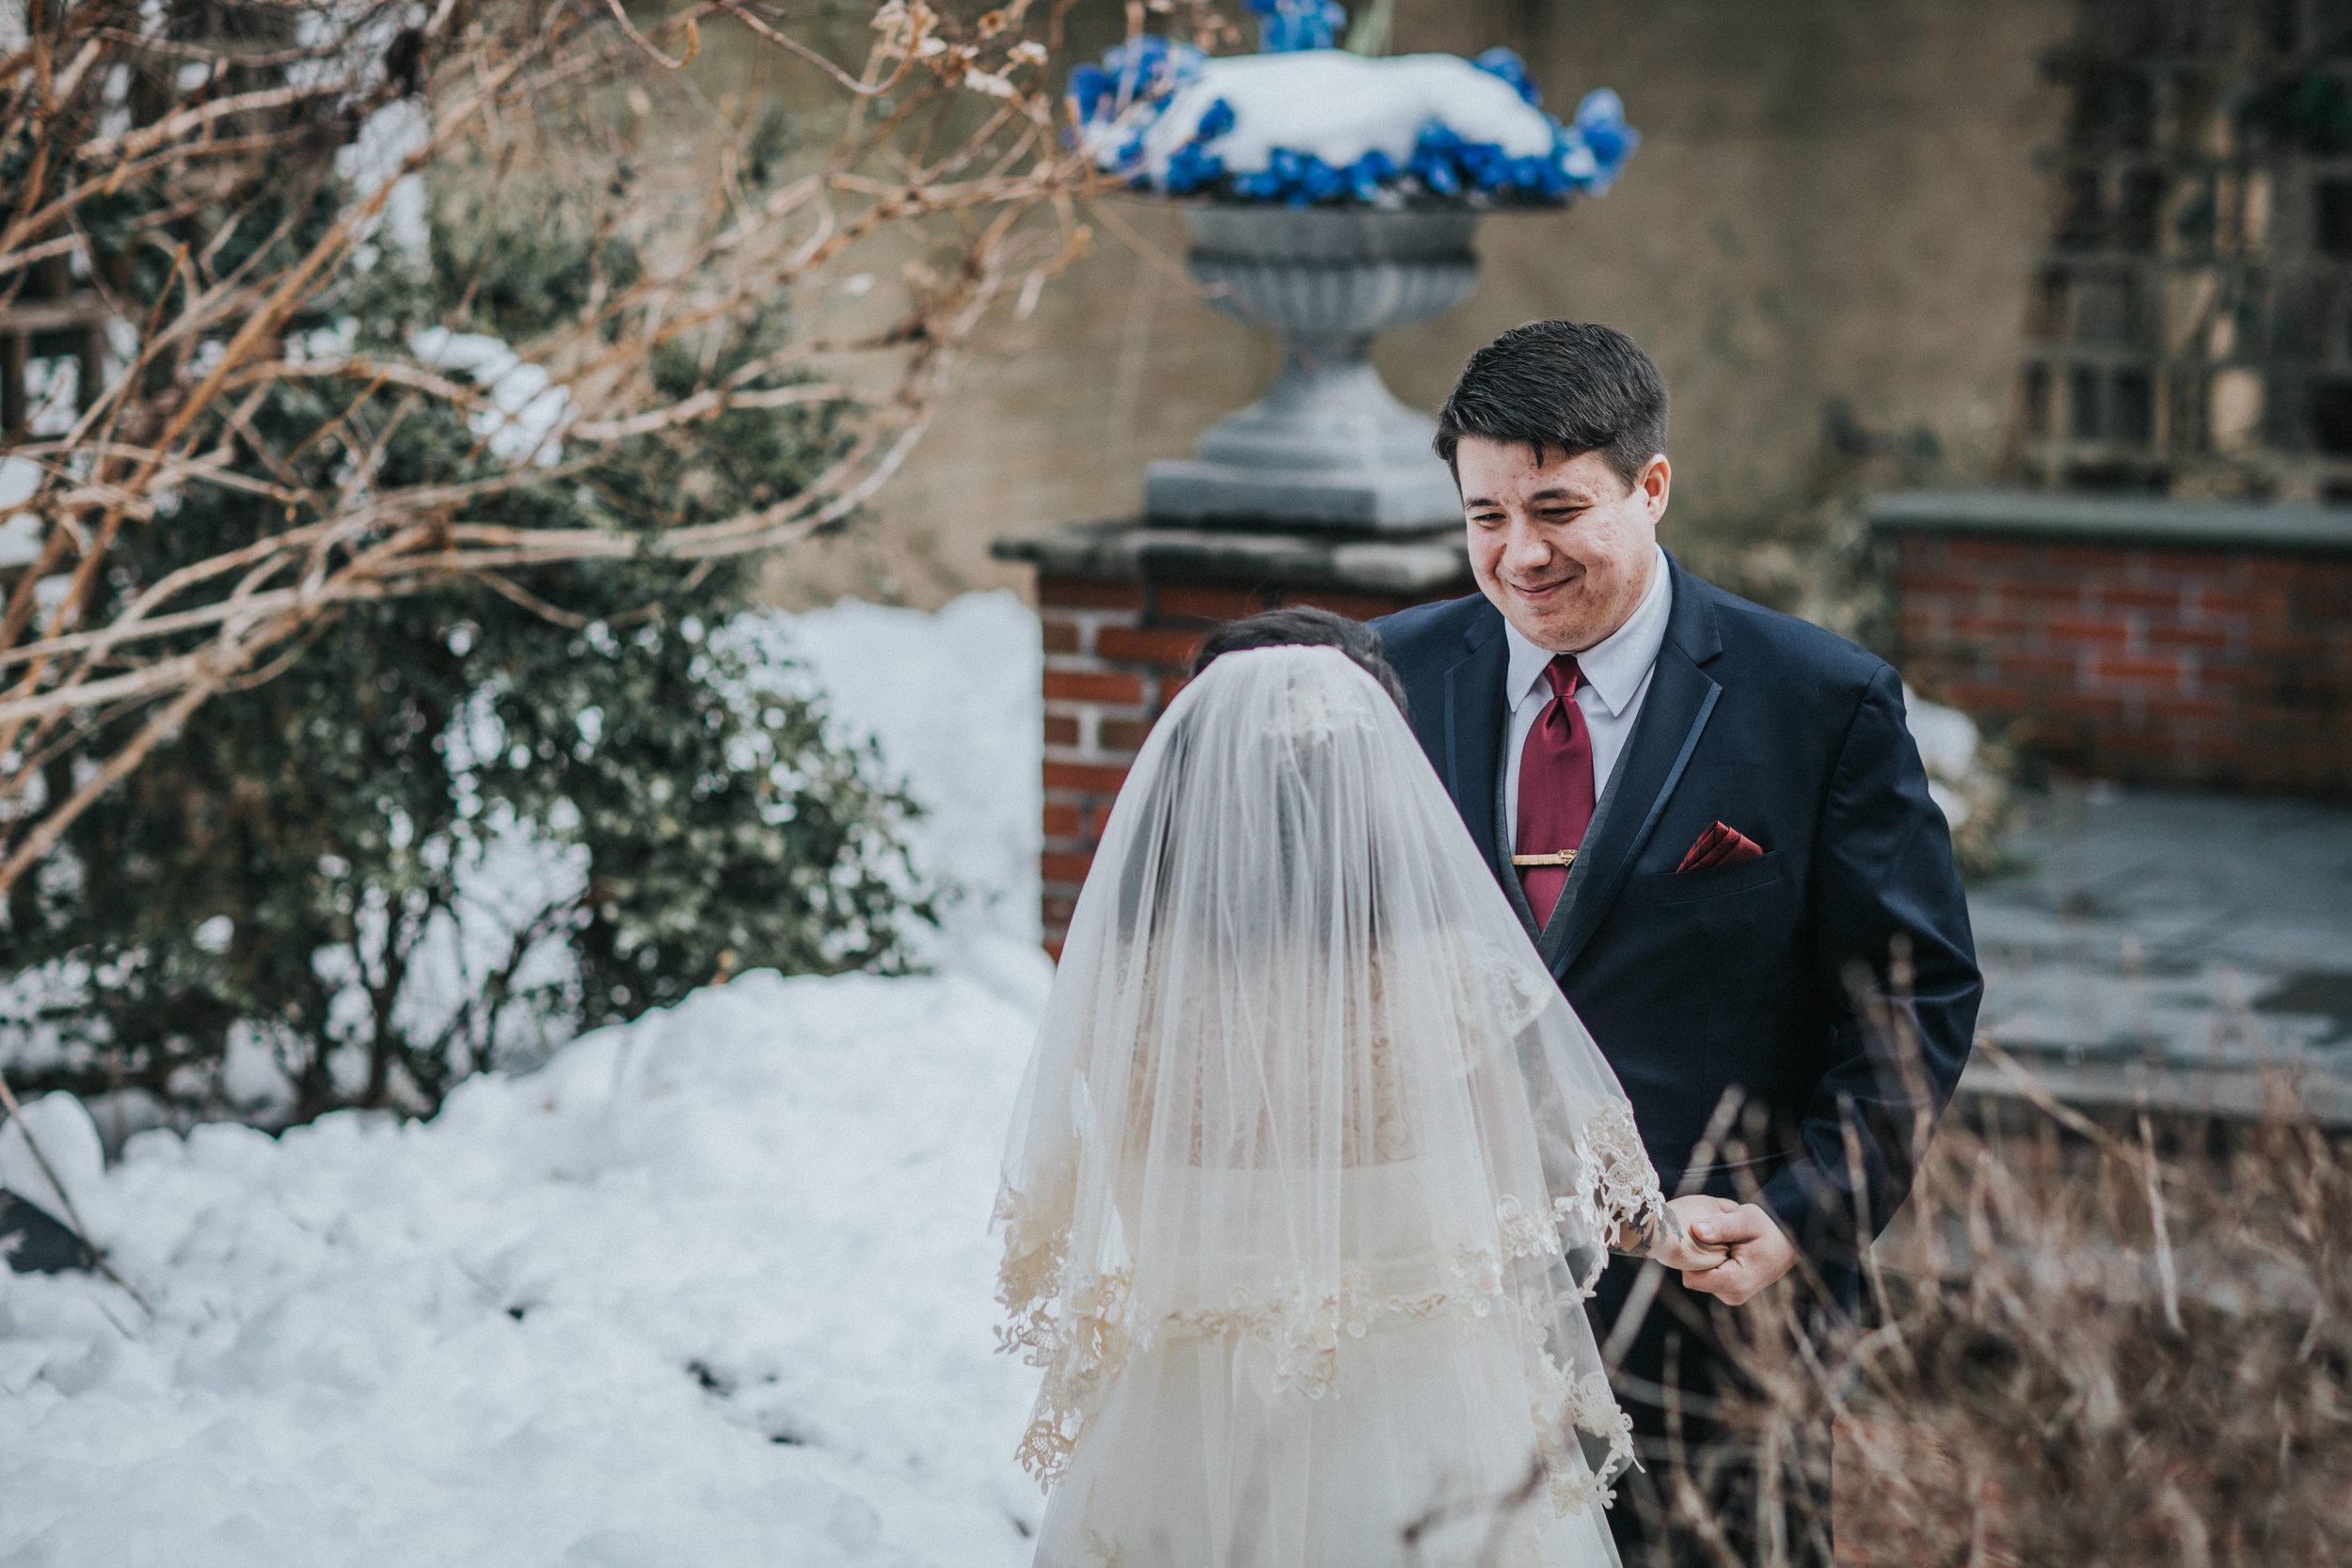 New-Jersey-Wedding-Photographer-ReceptionCenter-Valeria&Mike-First-Look-Bride&Groom (15 of 69).jpg